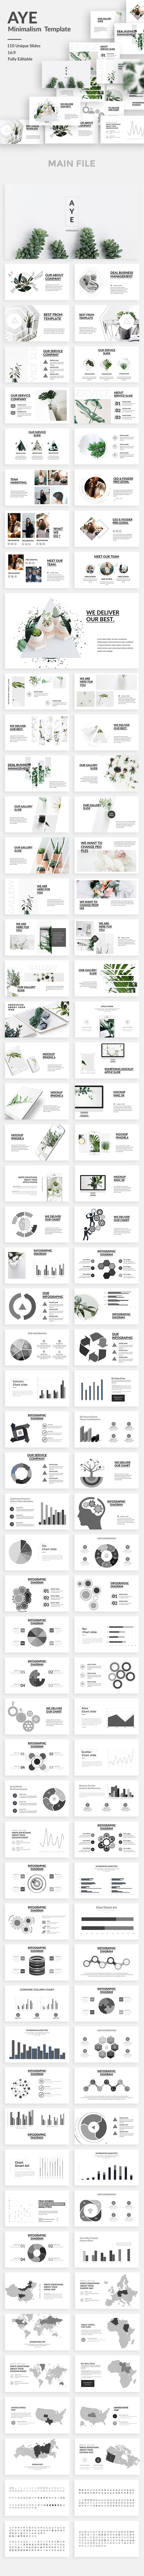 AYE Minimalism Google Slide Template - Google Slides Presentation Templates